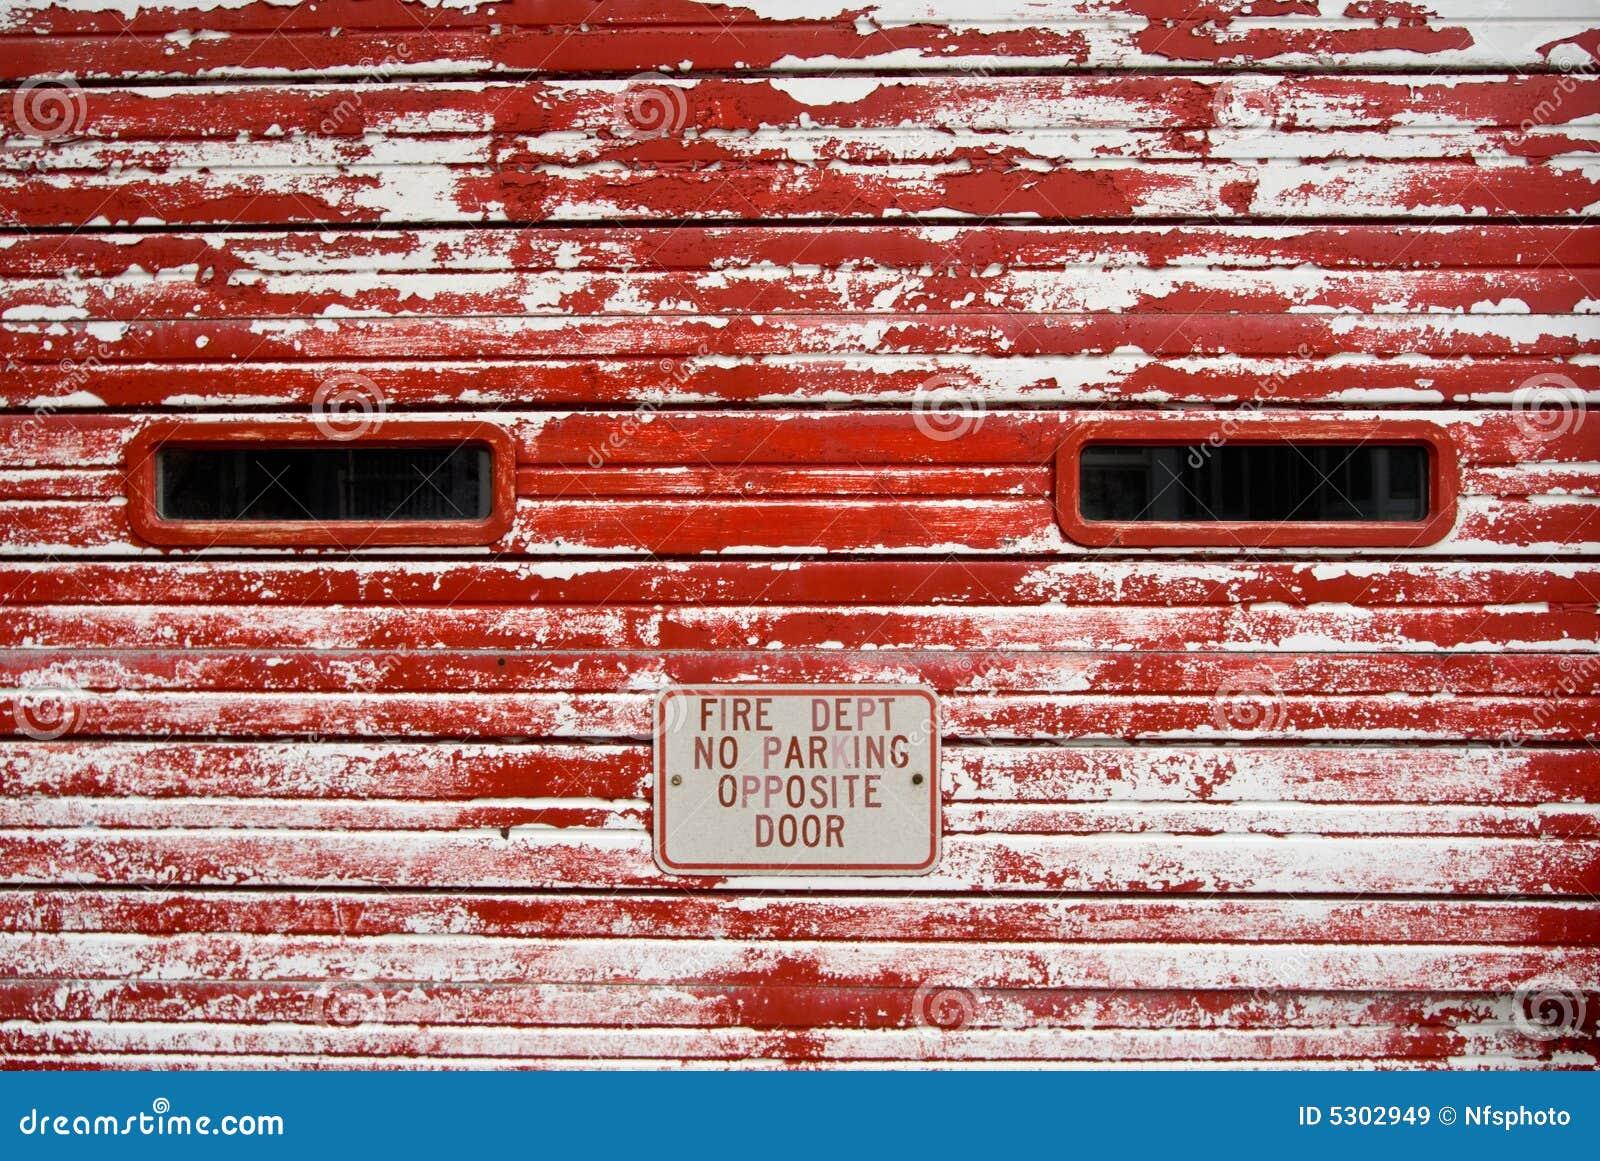 Vintage Garage Door With Peeling Red Paint Stock Image Image Of